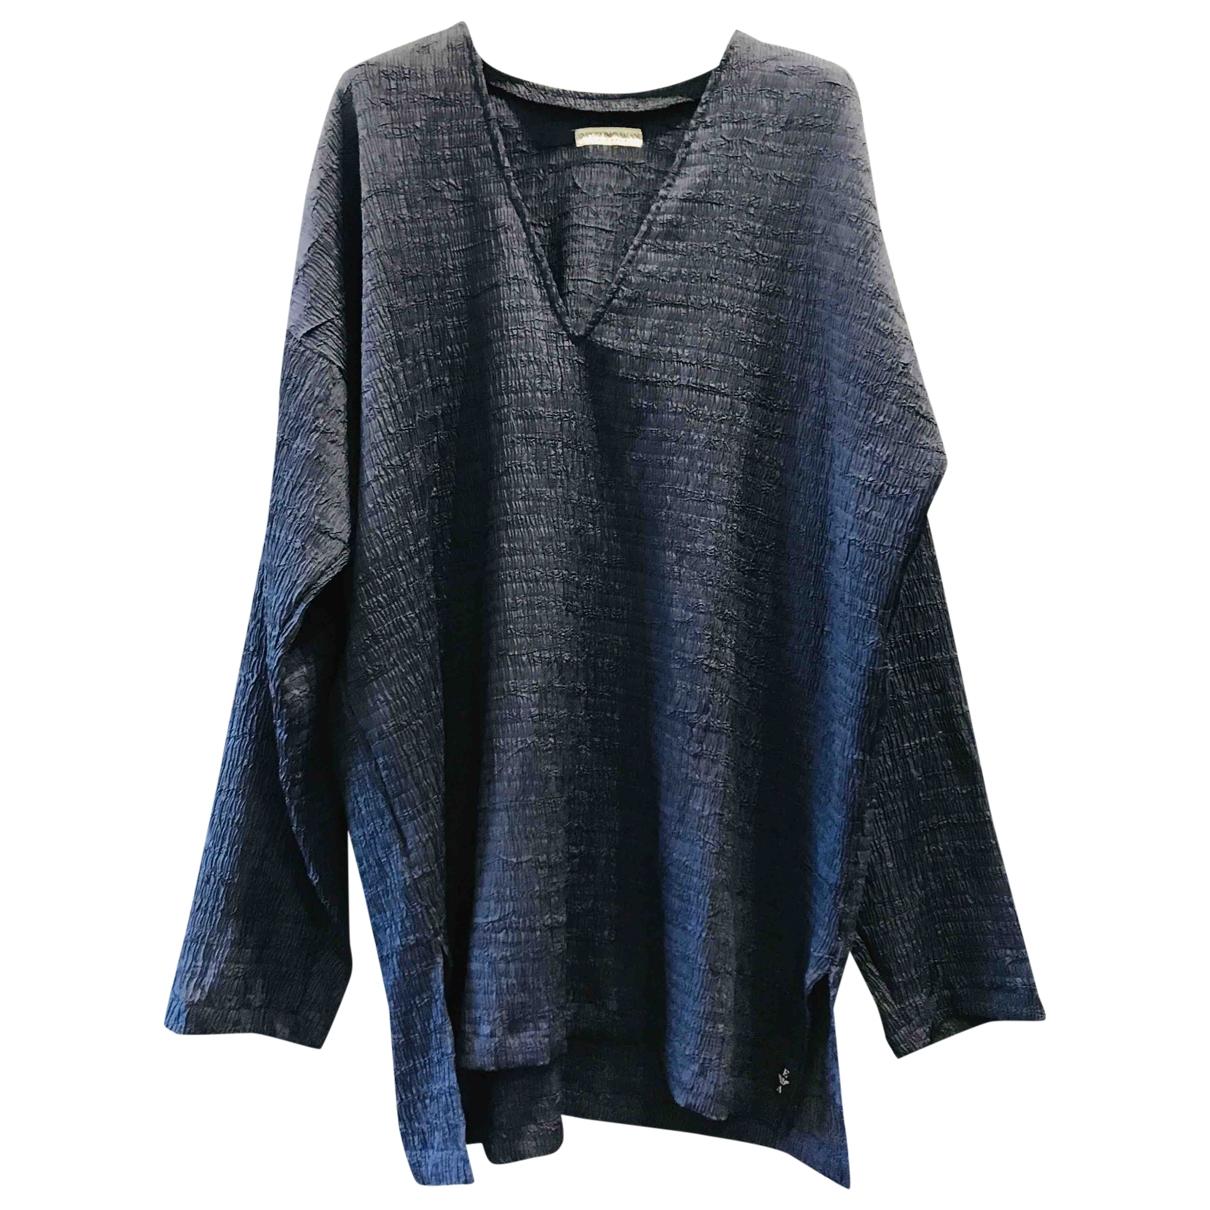 Emporio Armani - Chemises   pour homme - marine